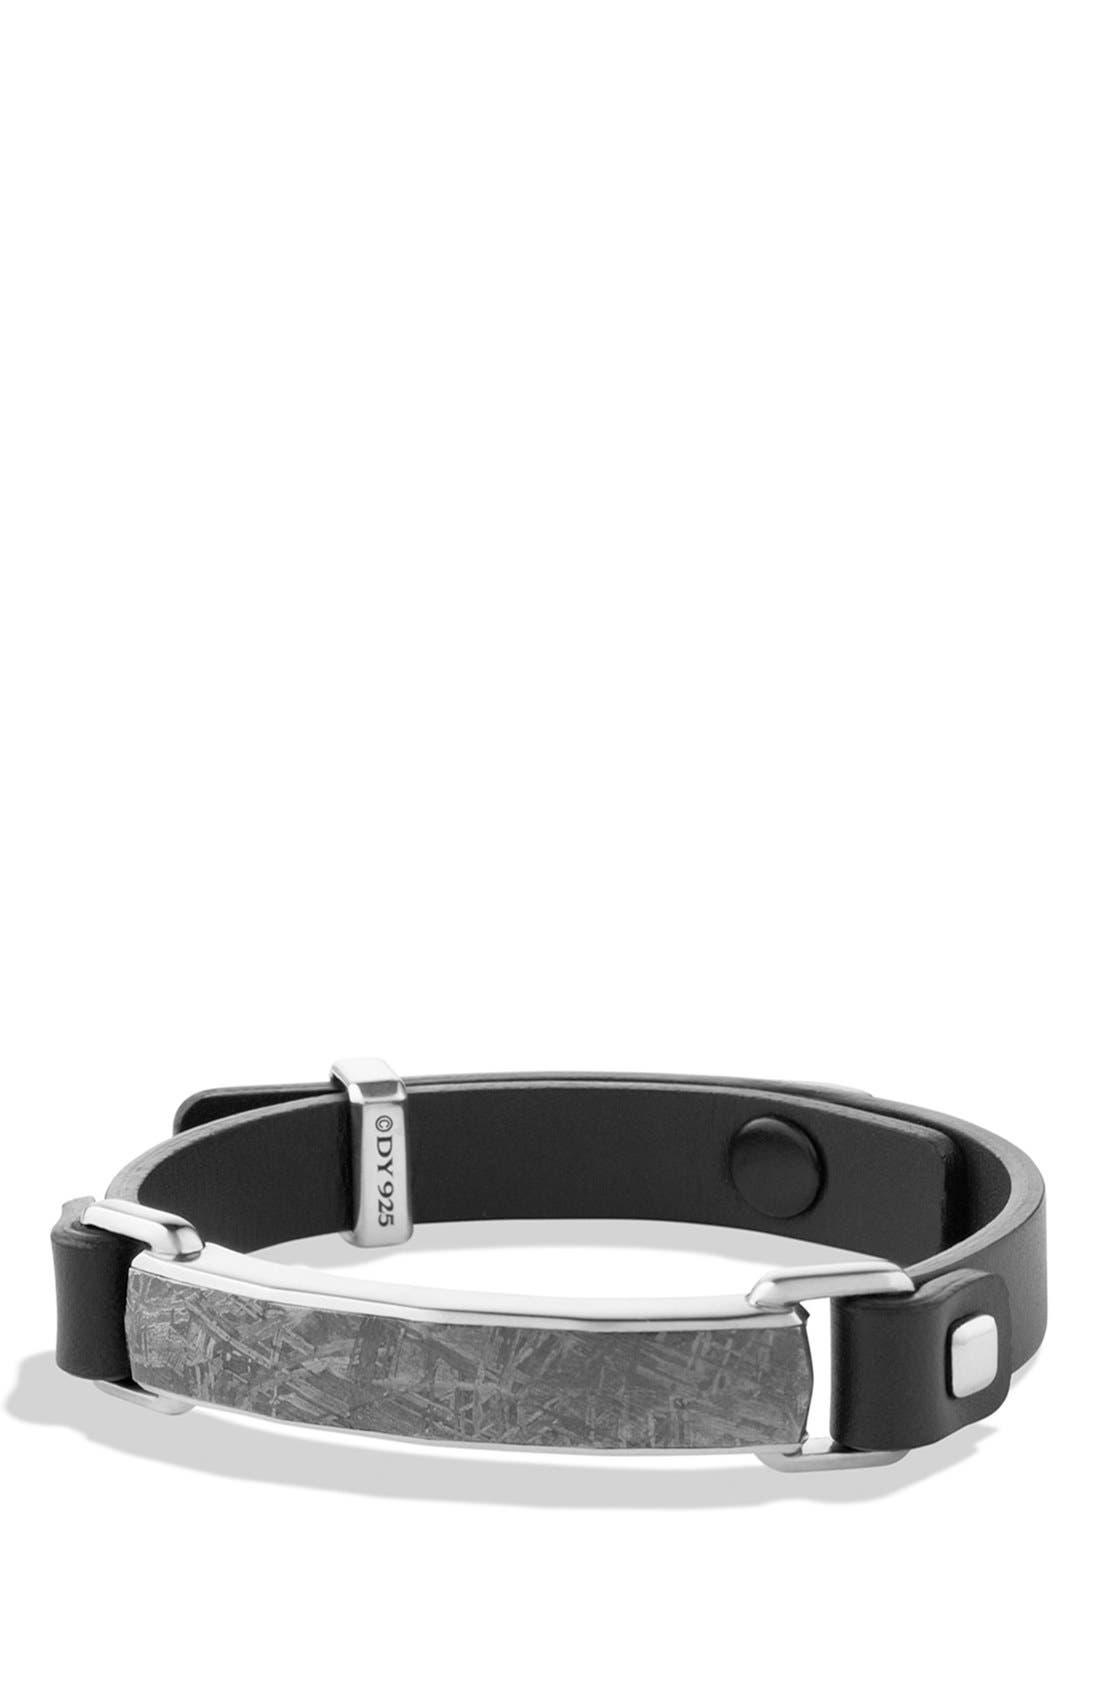 'Meteorite' Leather ID Bracelet in Black,                             Main thumbnail 1, color,